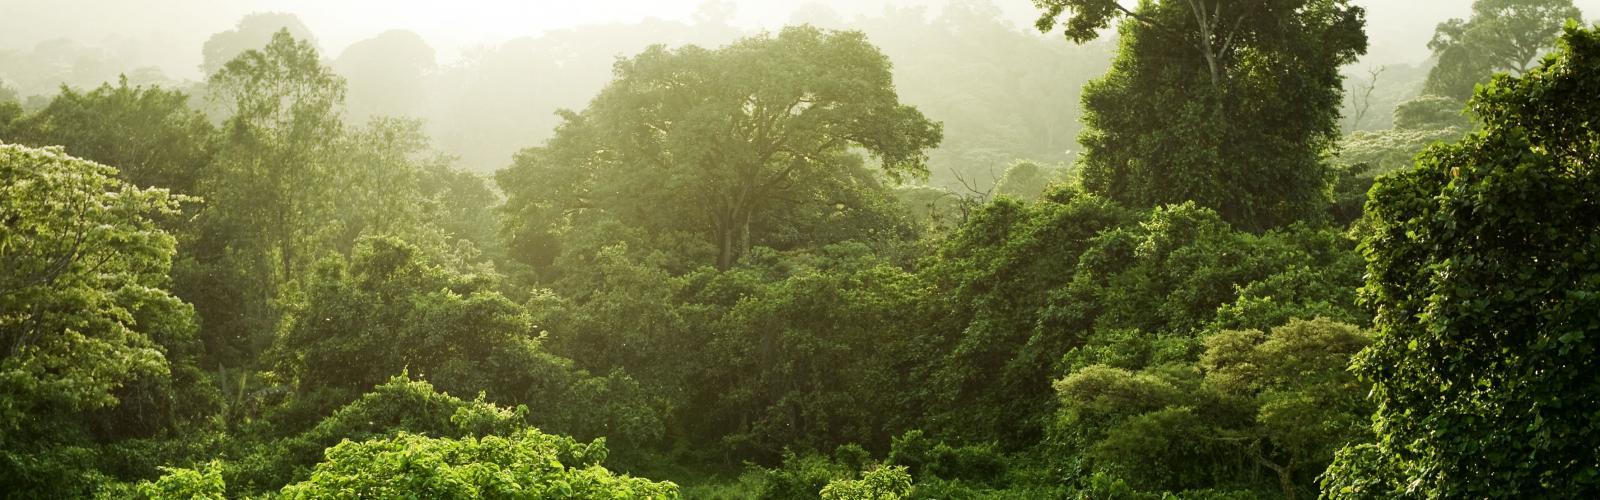 banner-coffee-and-tree-nursery